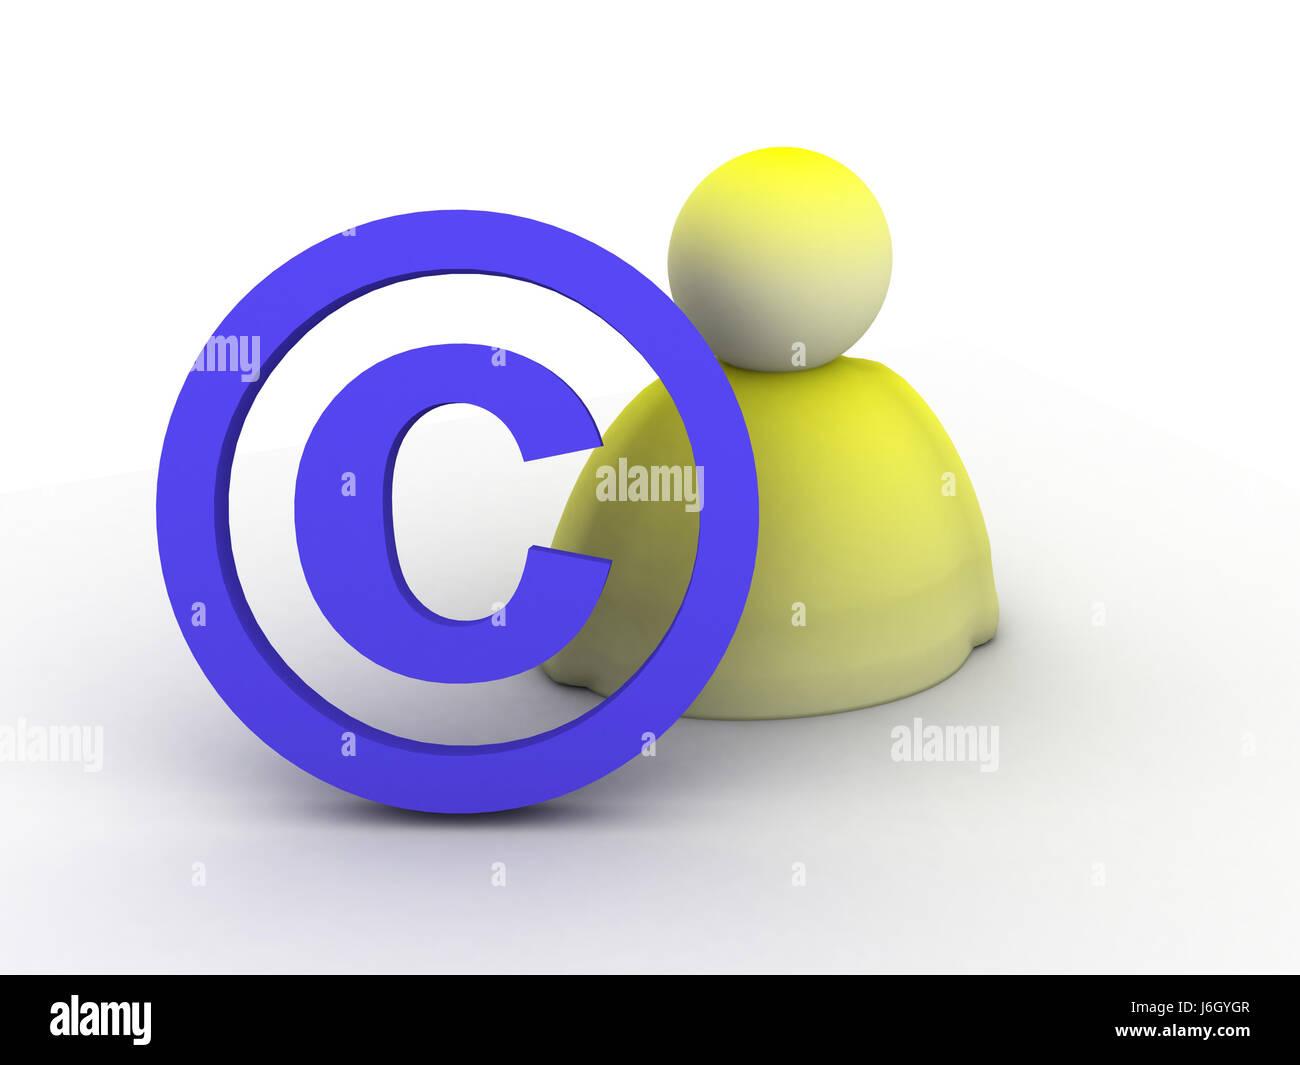 Icon Register Copyright Trademark License Pictogram Symbol